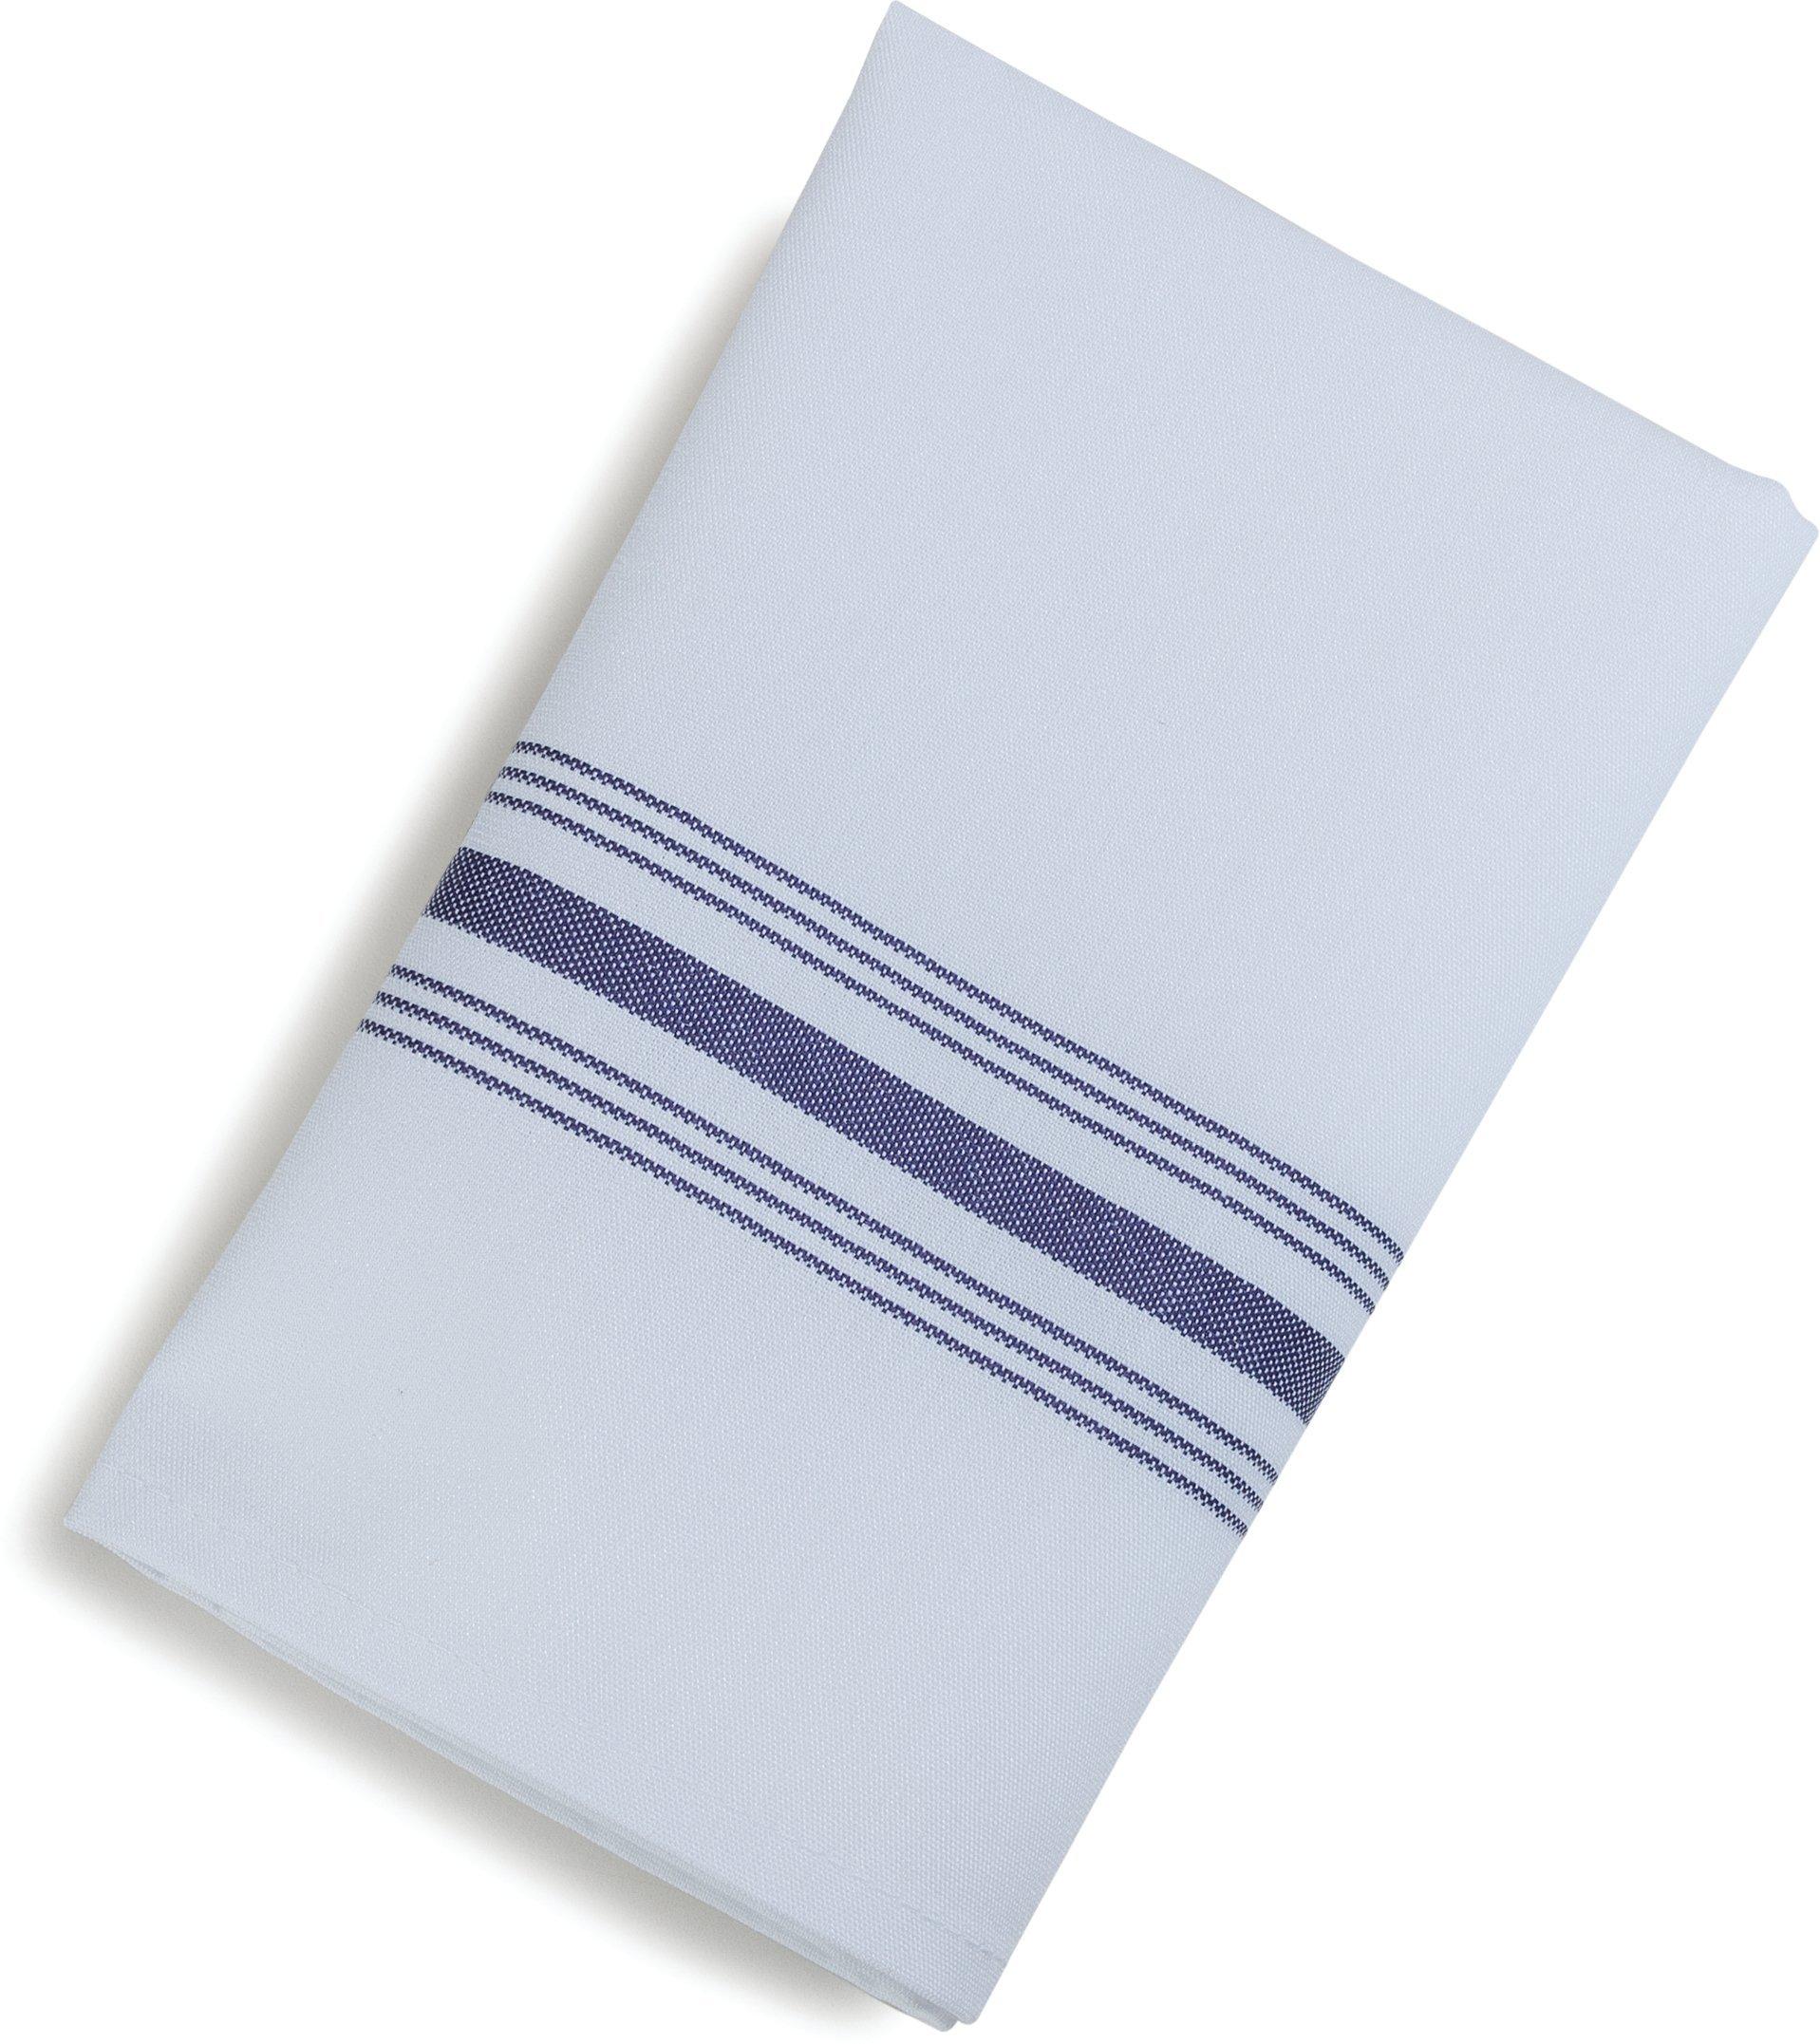 Carlisle 53771822NH052 Restaurant Quality Cloth Dinner/Bistro Napkins, 18'' x 22'', Purple Stripe (Pack of 12)